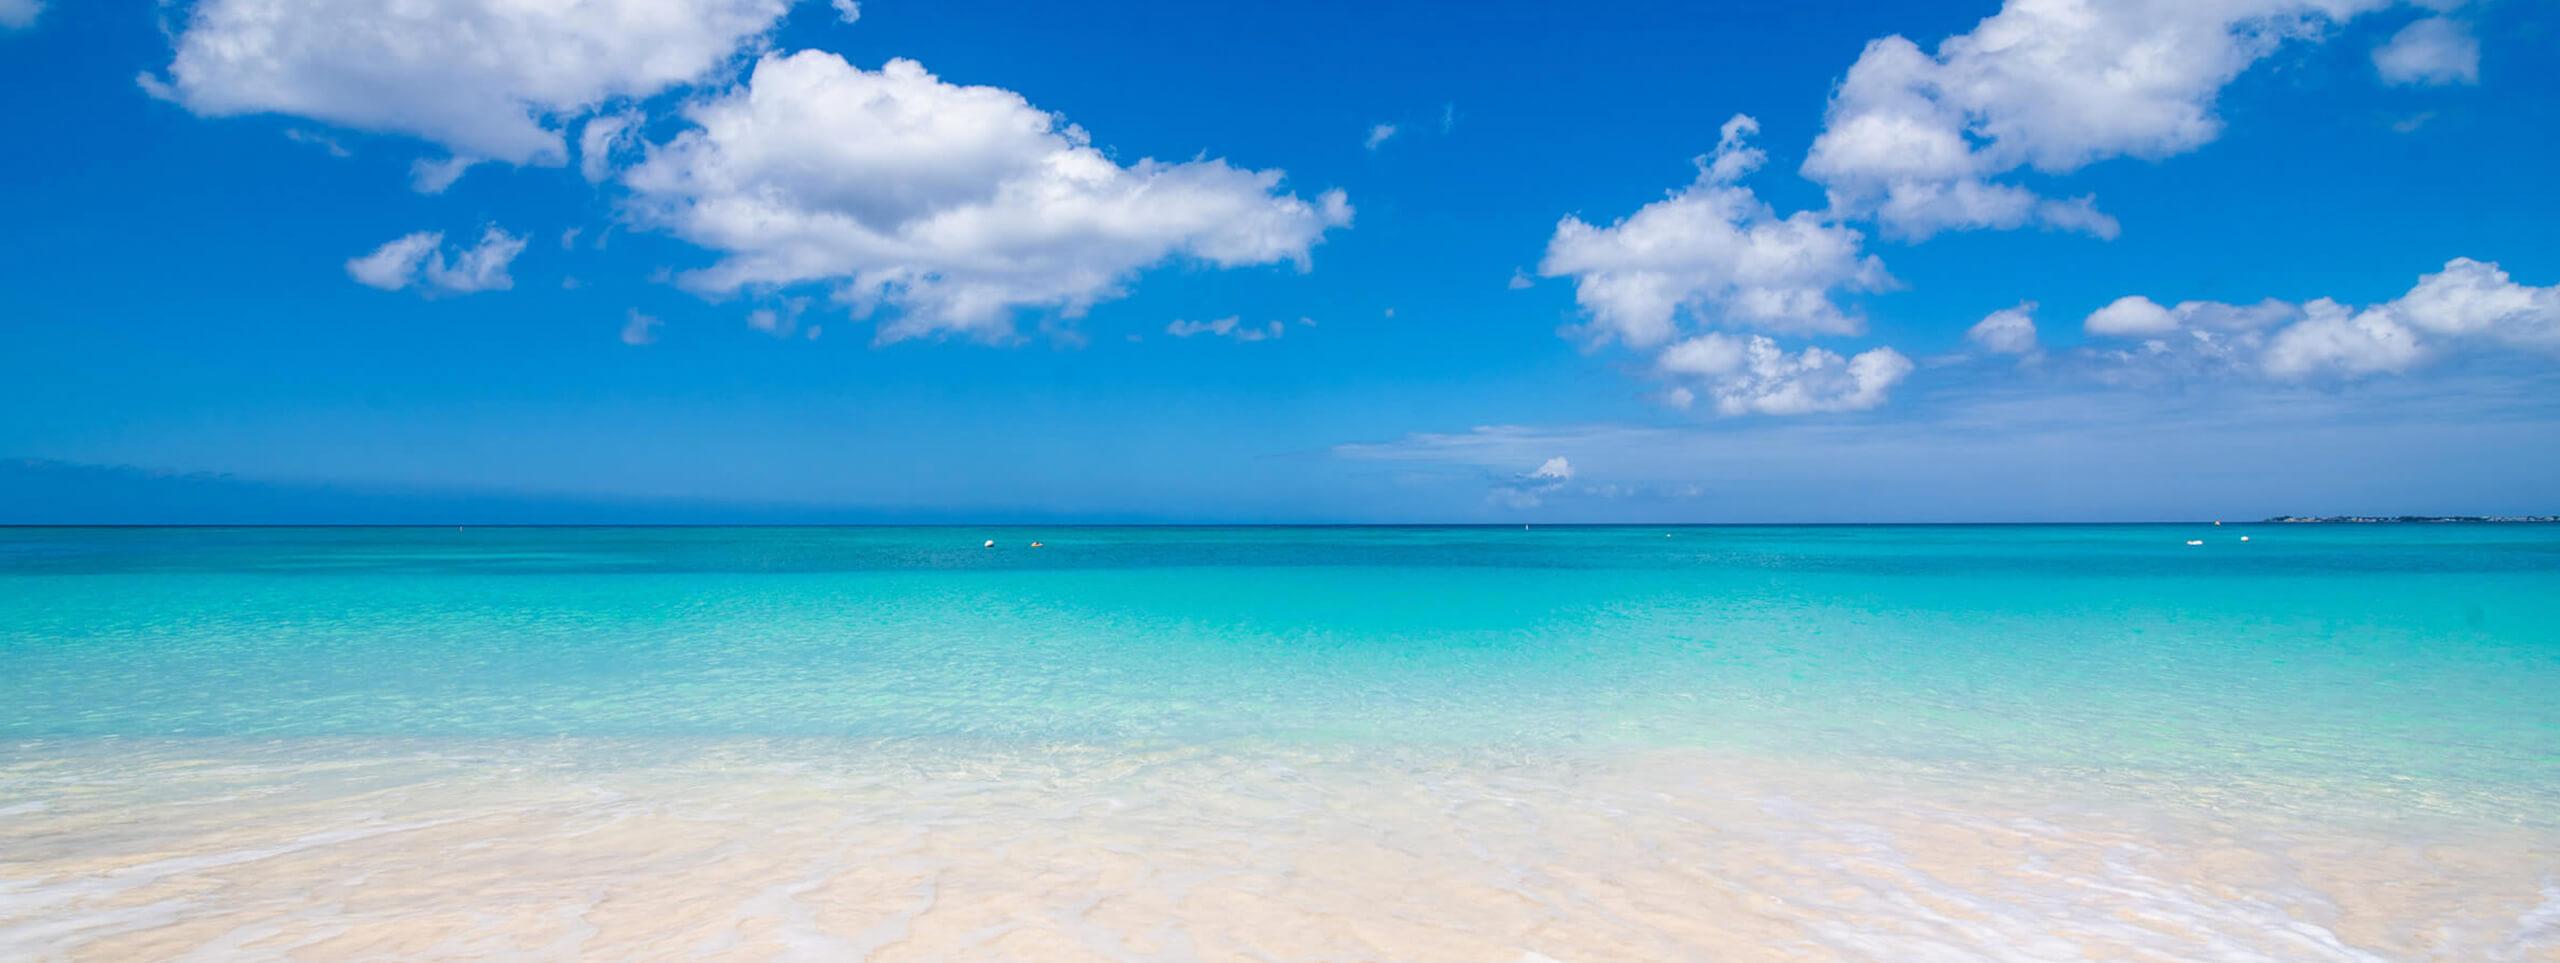 Seascape Villa Cayman Islands Blog Post